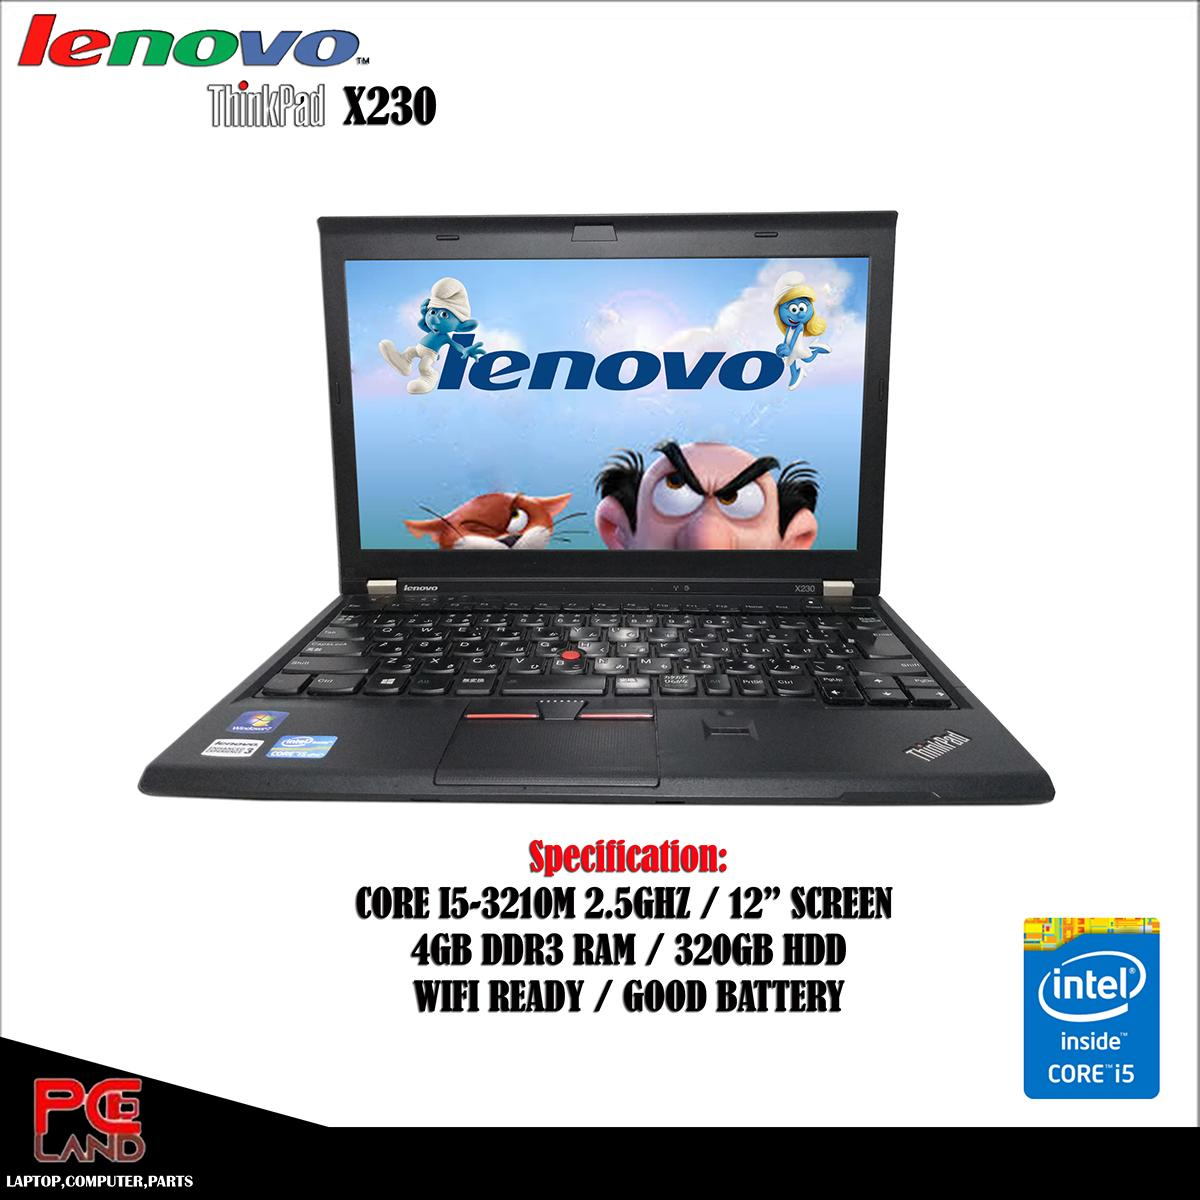 Lenovo Philippines - Lenovo Laptop for sale - prices & reviews | Lazada